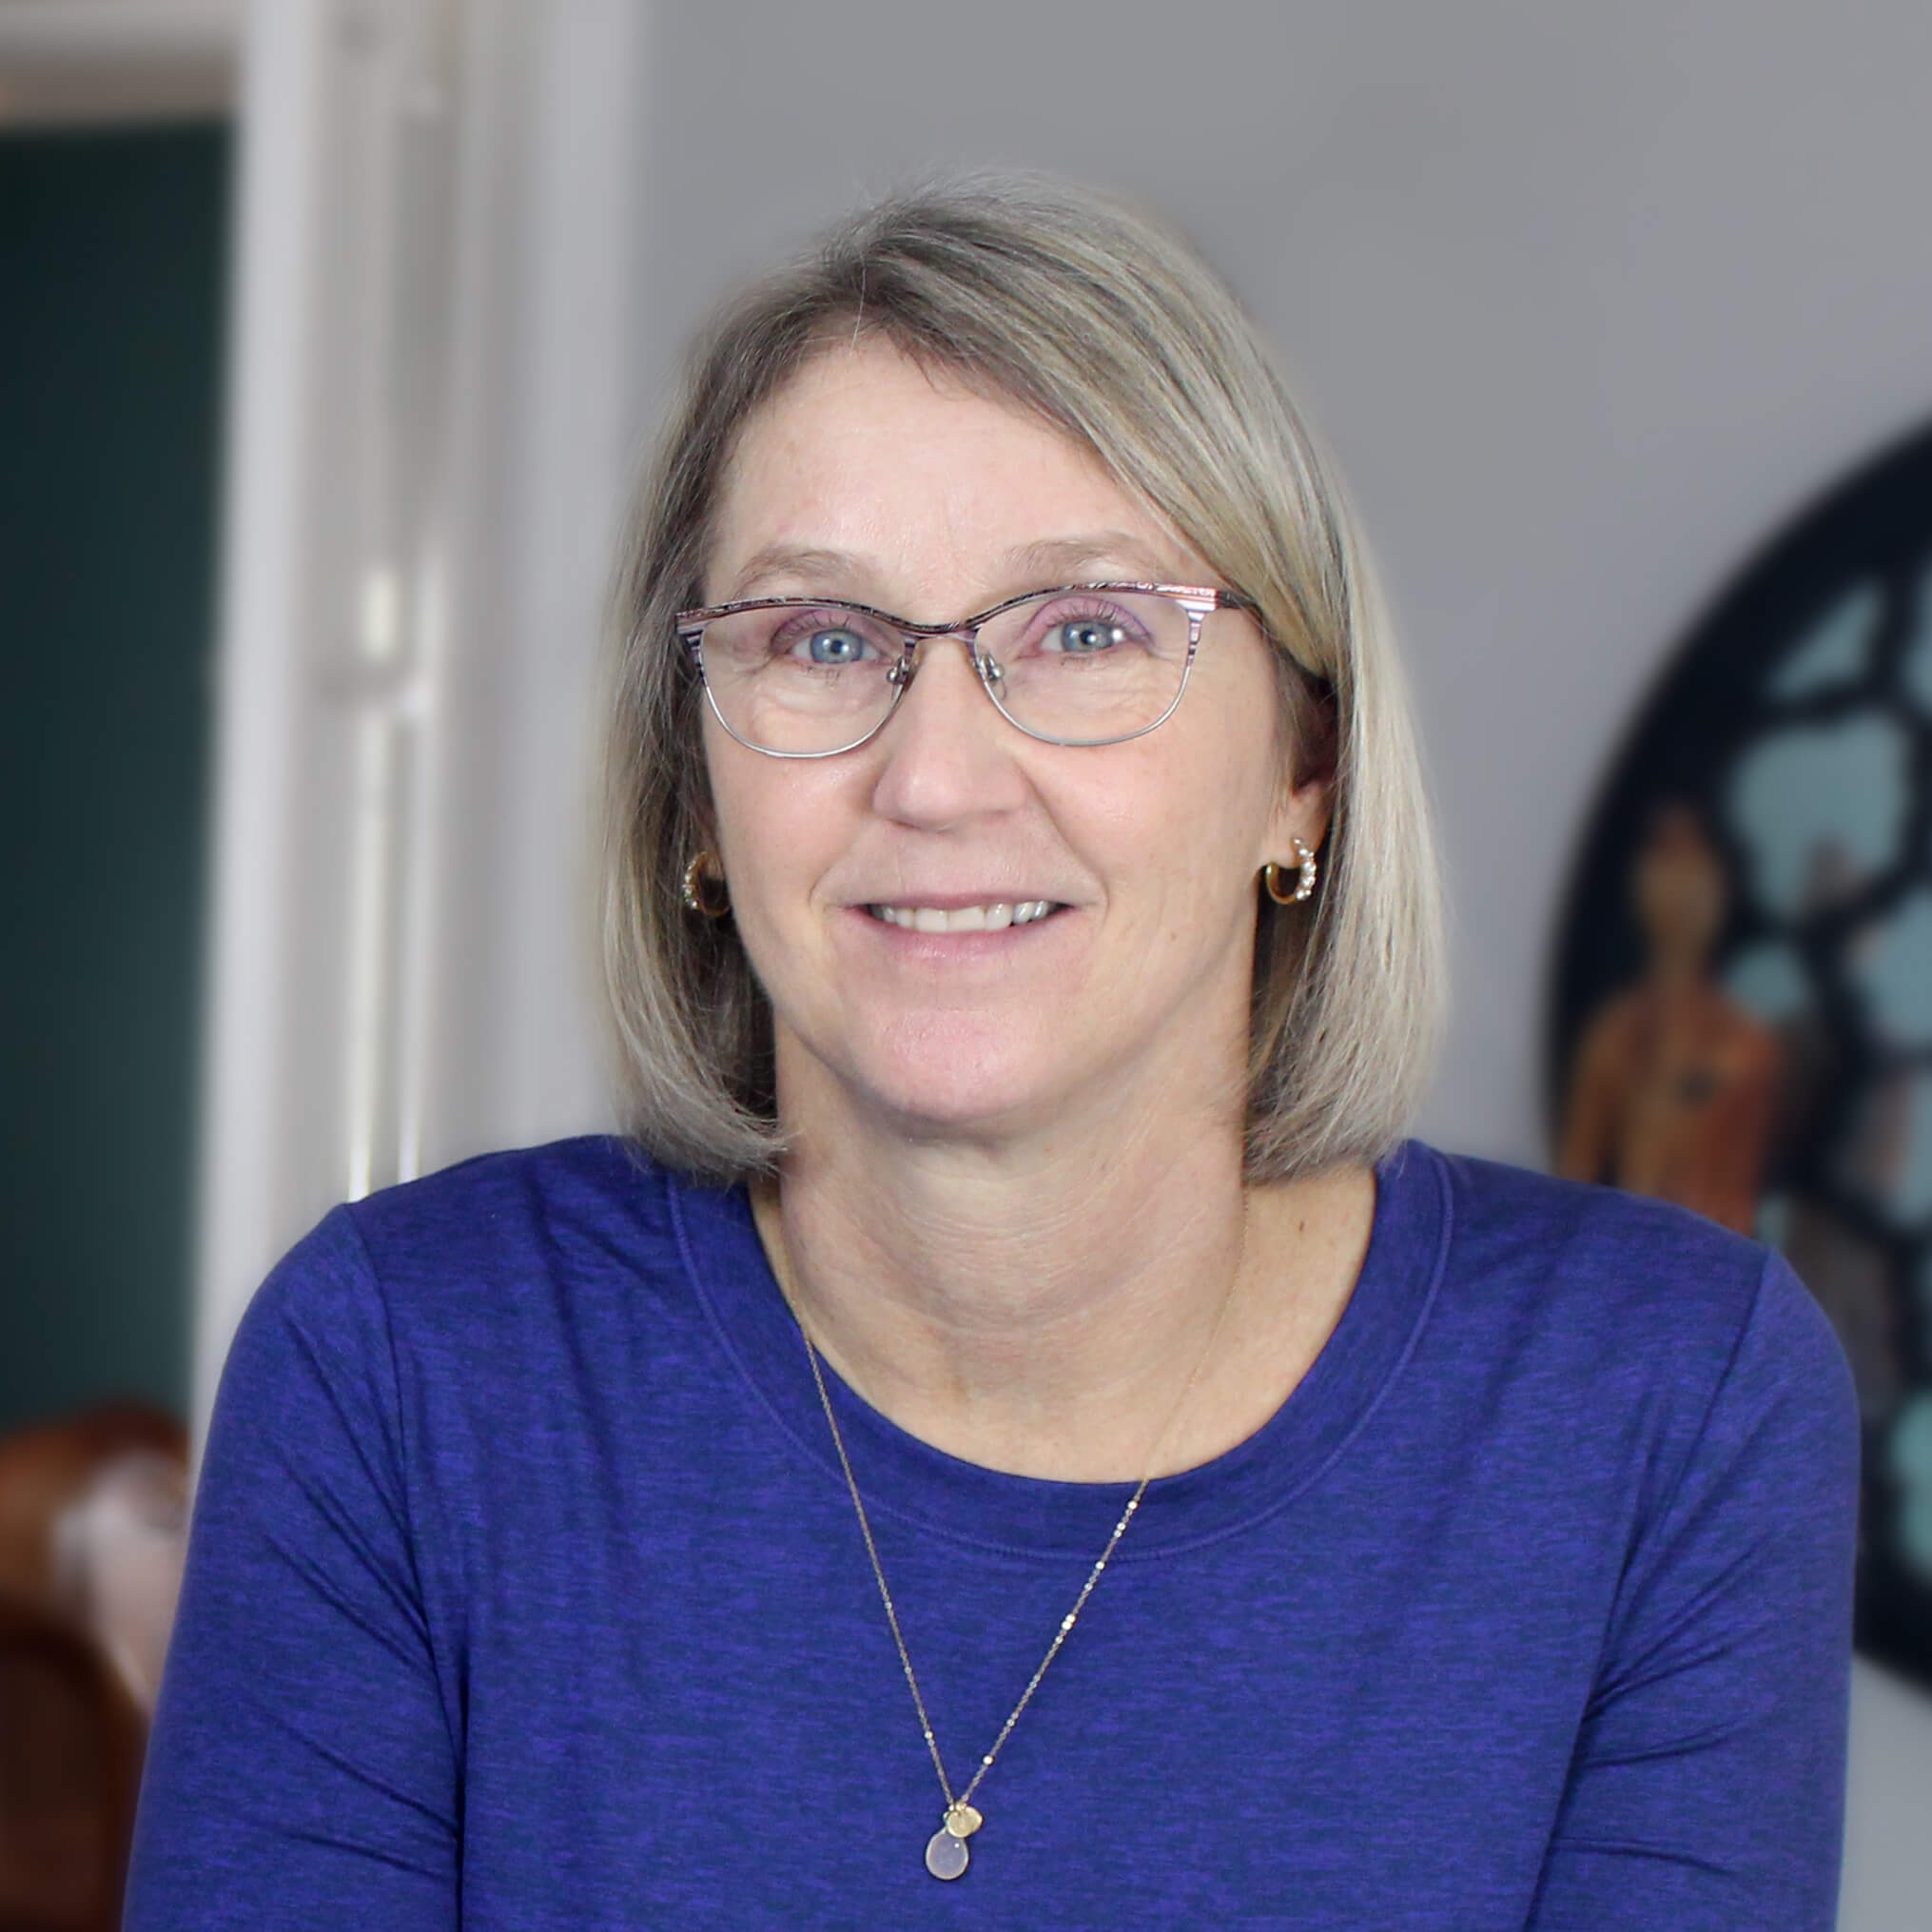 Linda Goulet Headshot